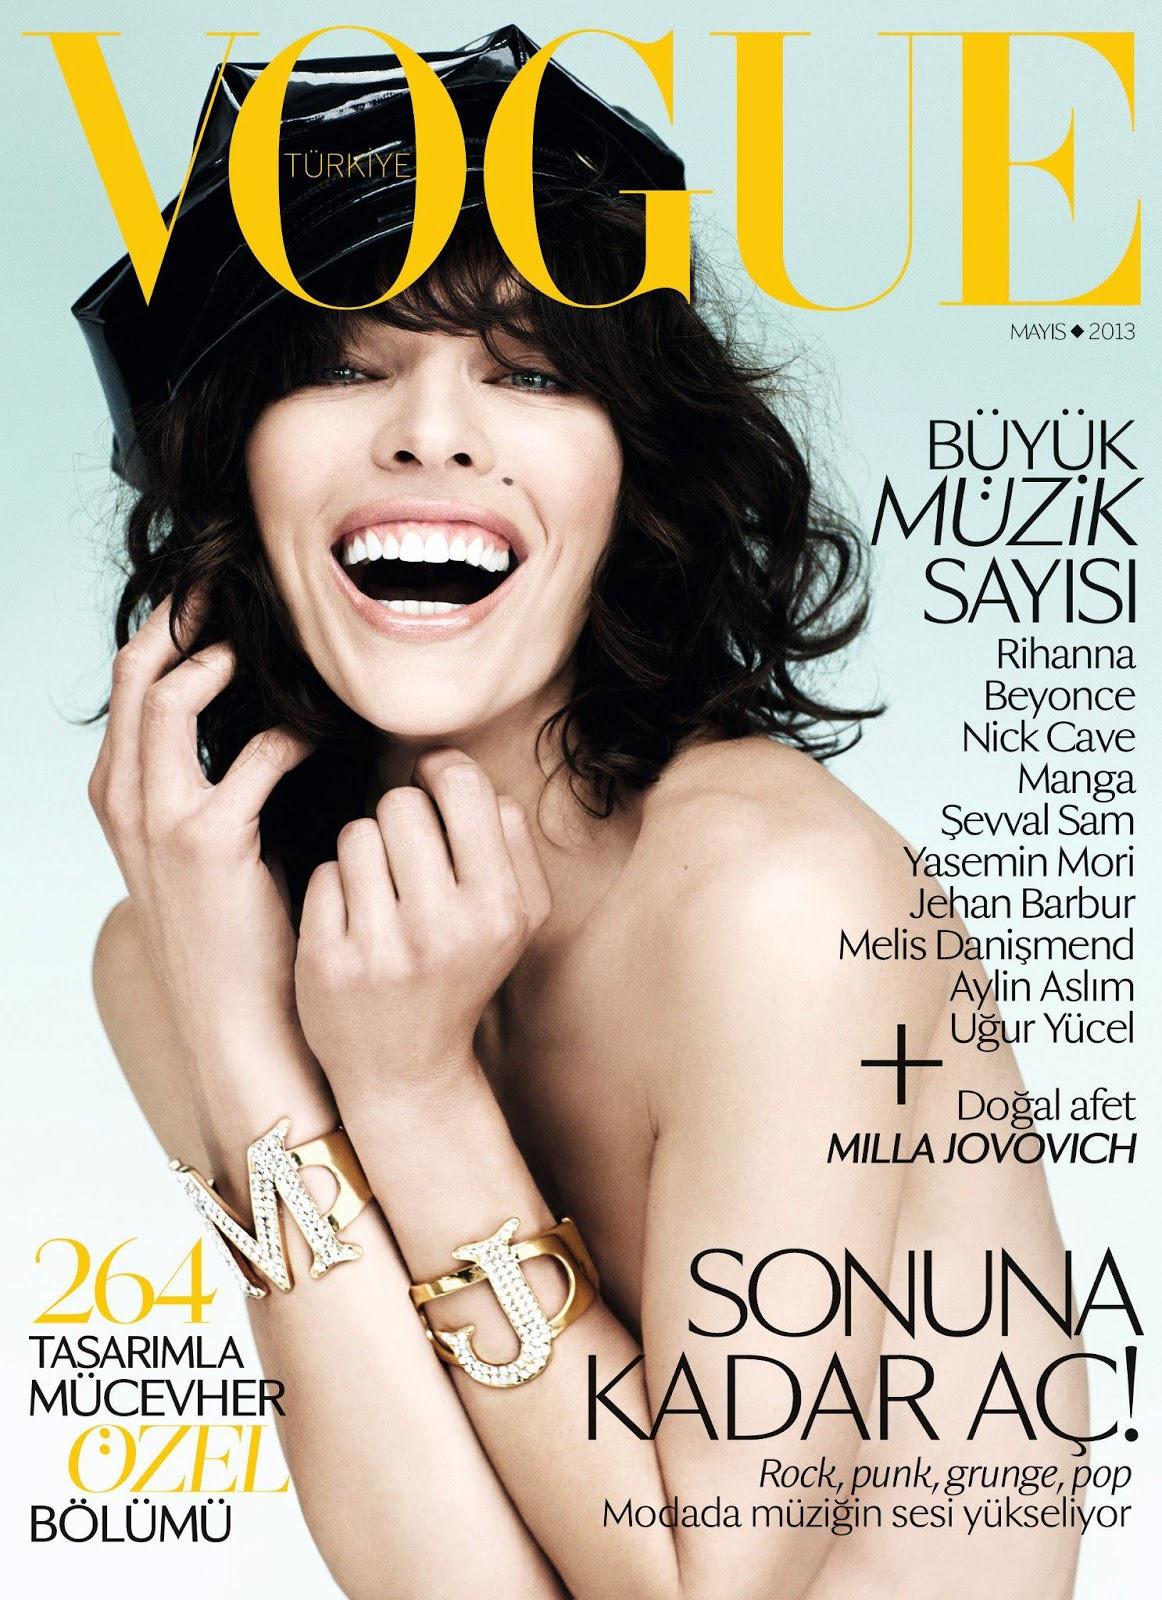 http://2.bp.blogspot.com/--_whsbEKgN4/UYJlsy9d_eI/AAAAAAABQ64/ZLSCjM8ZZHg/s1600/Vogue-Turkey-May-2013-Milla-Jovovich-Magazine-Cover.jpg